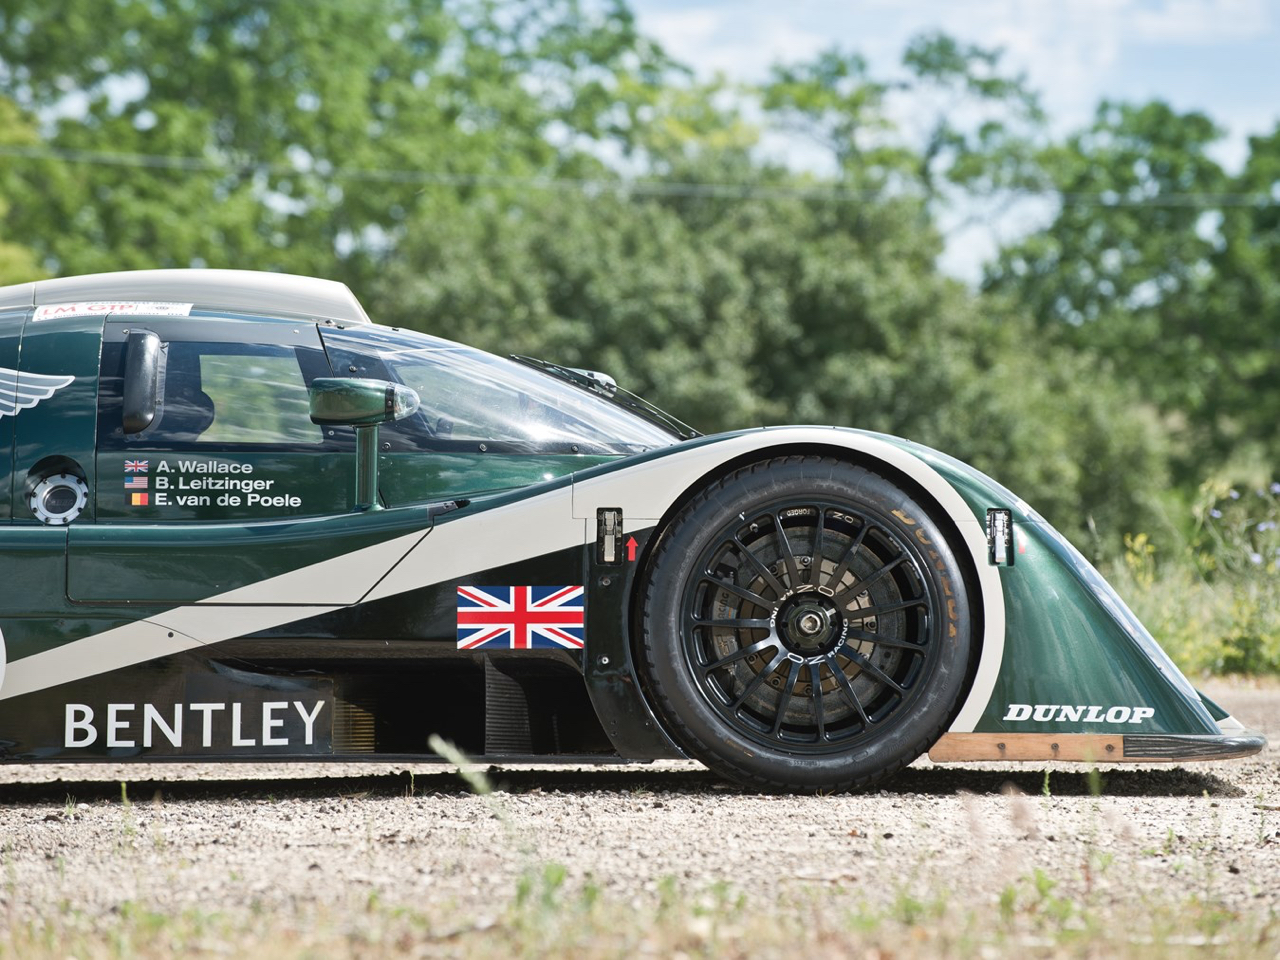 Engine Sound : Bentley Speed 8 - 3 années pour 1 victoire ! 41